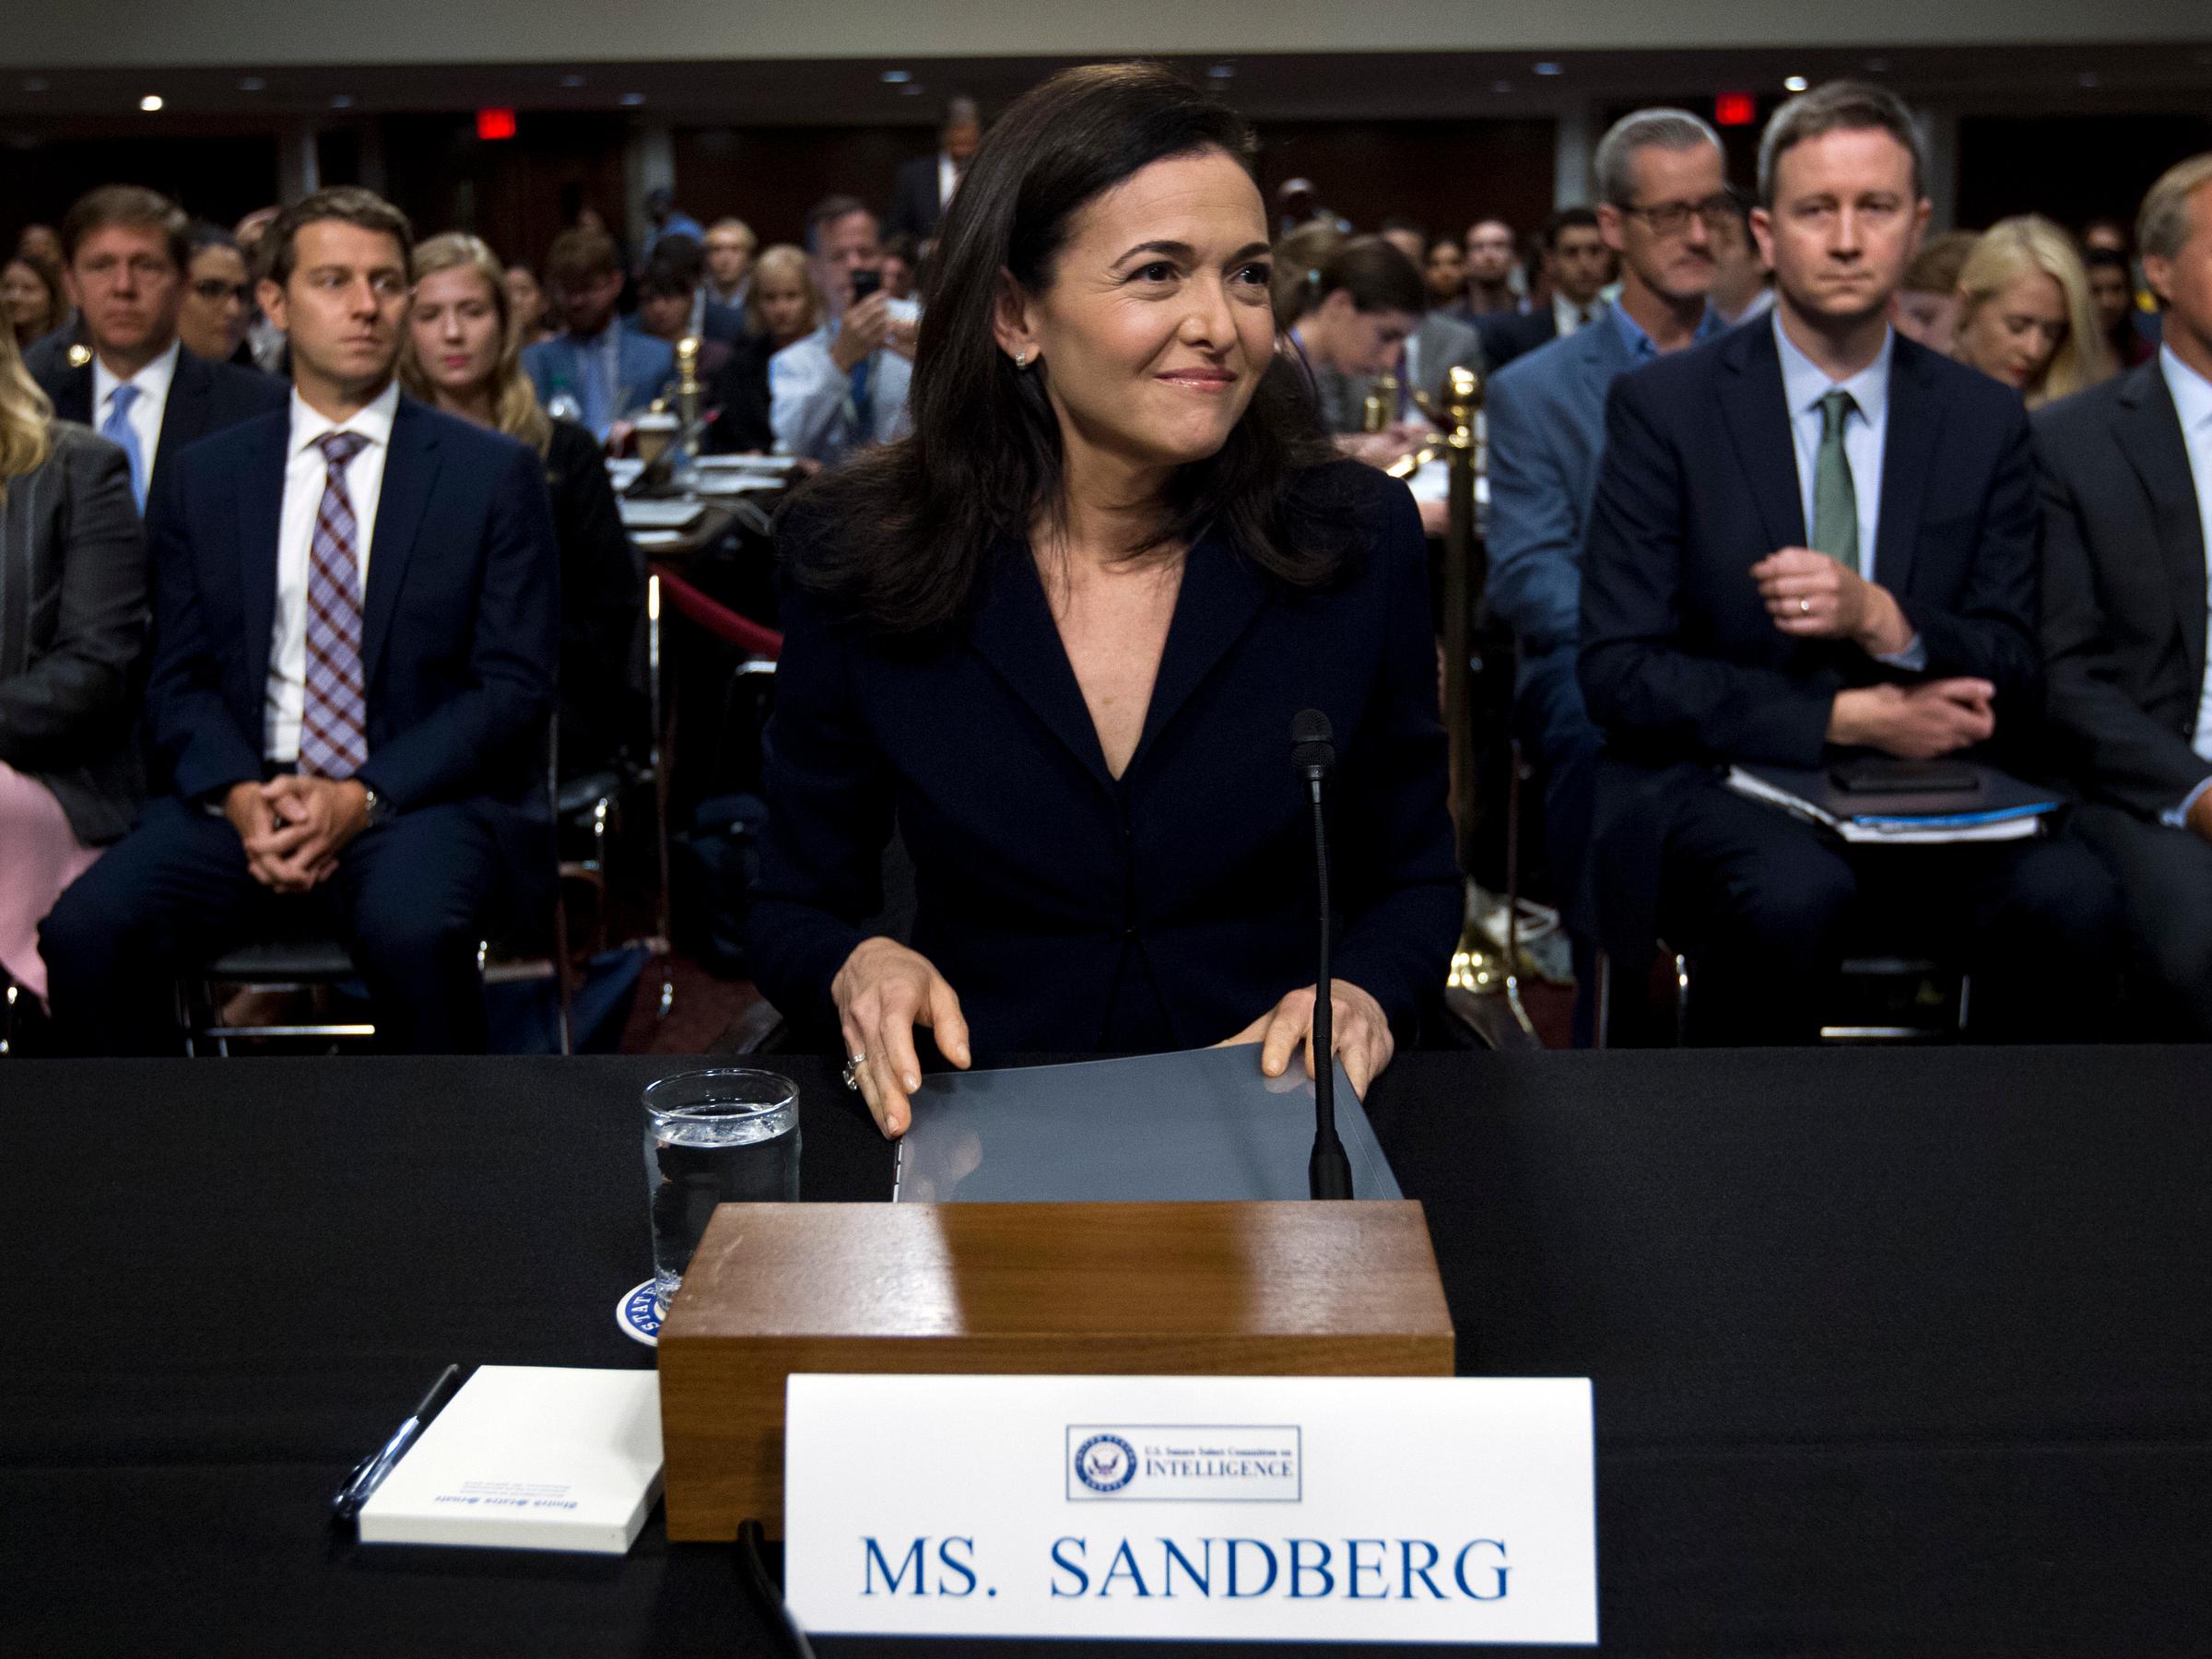 sheryl sandberg senate intelligence committee 2016 election